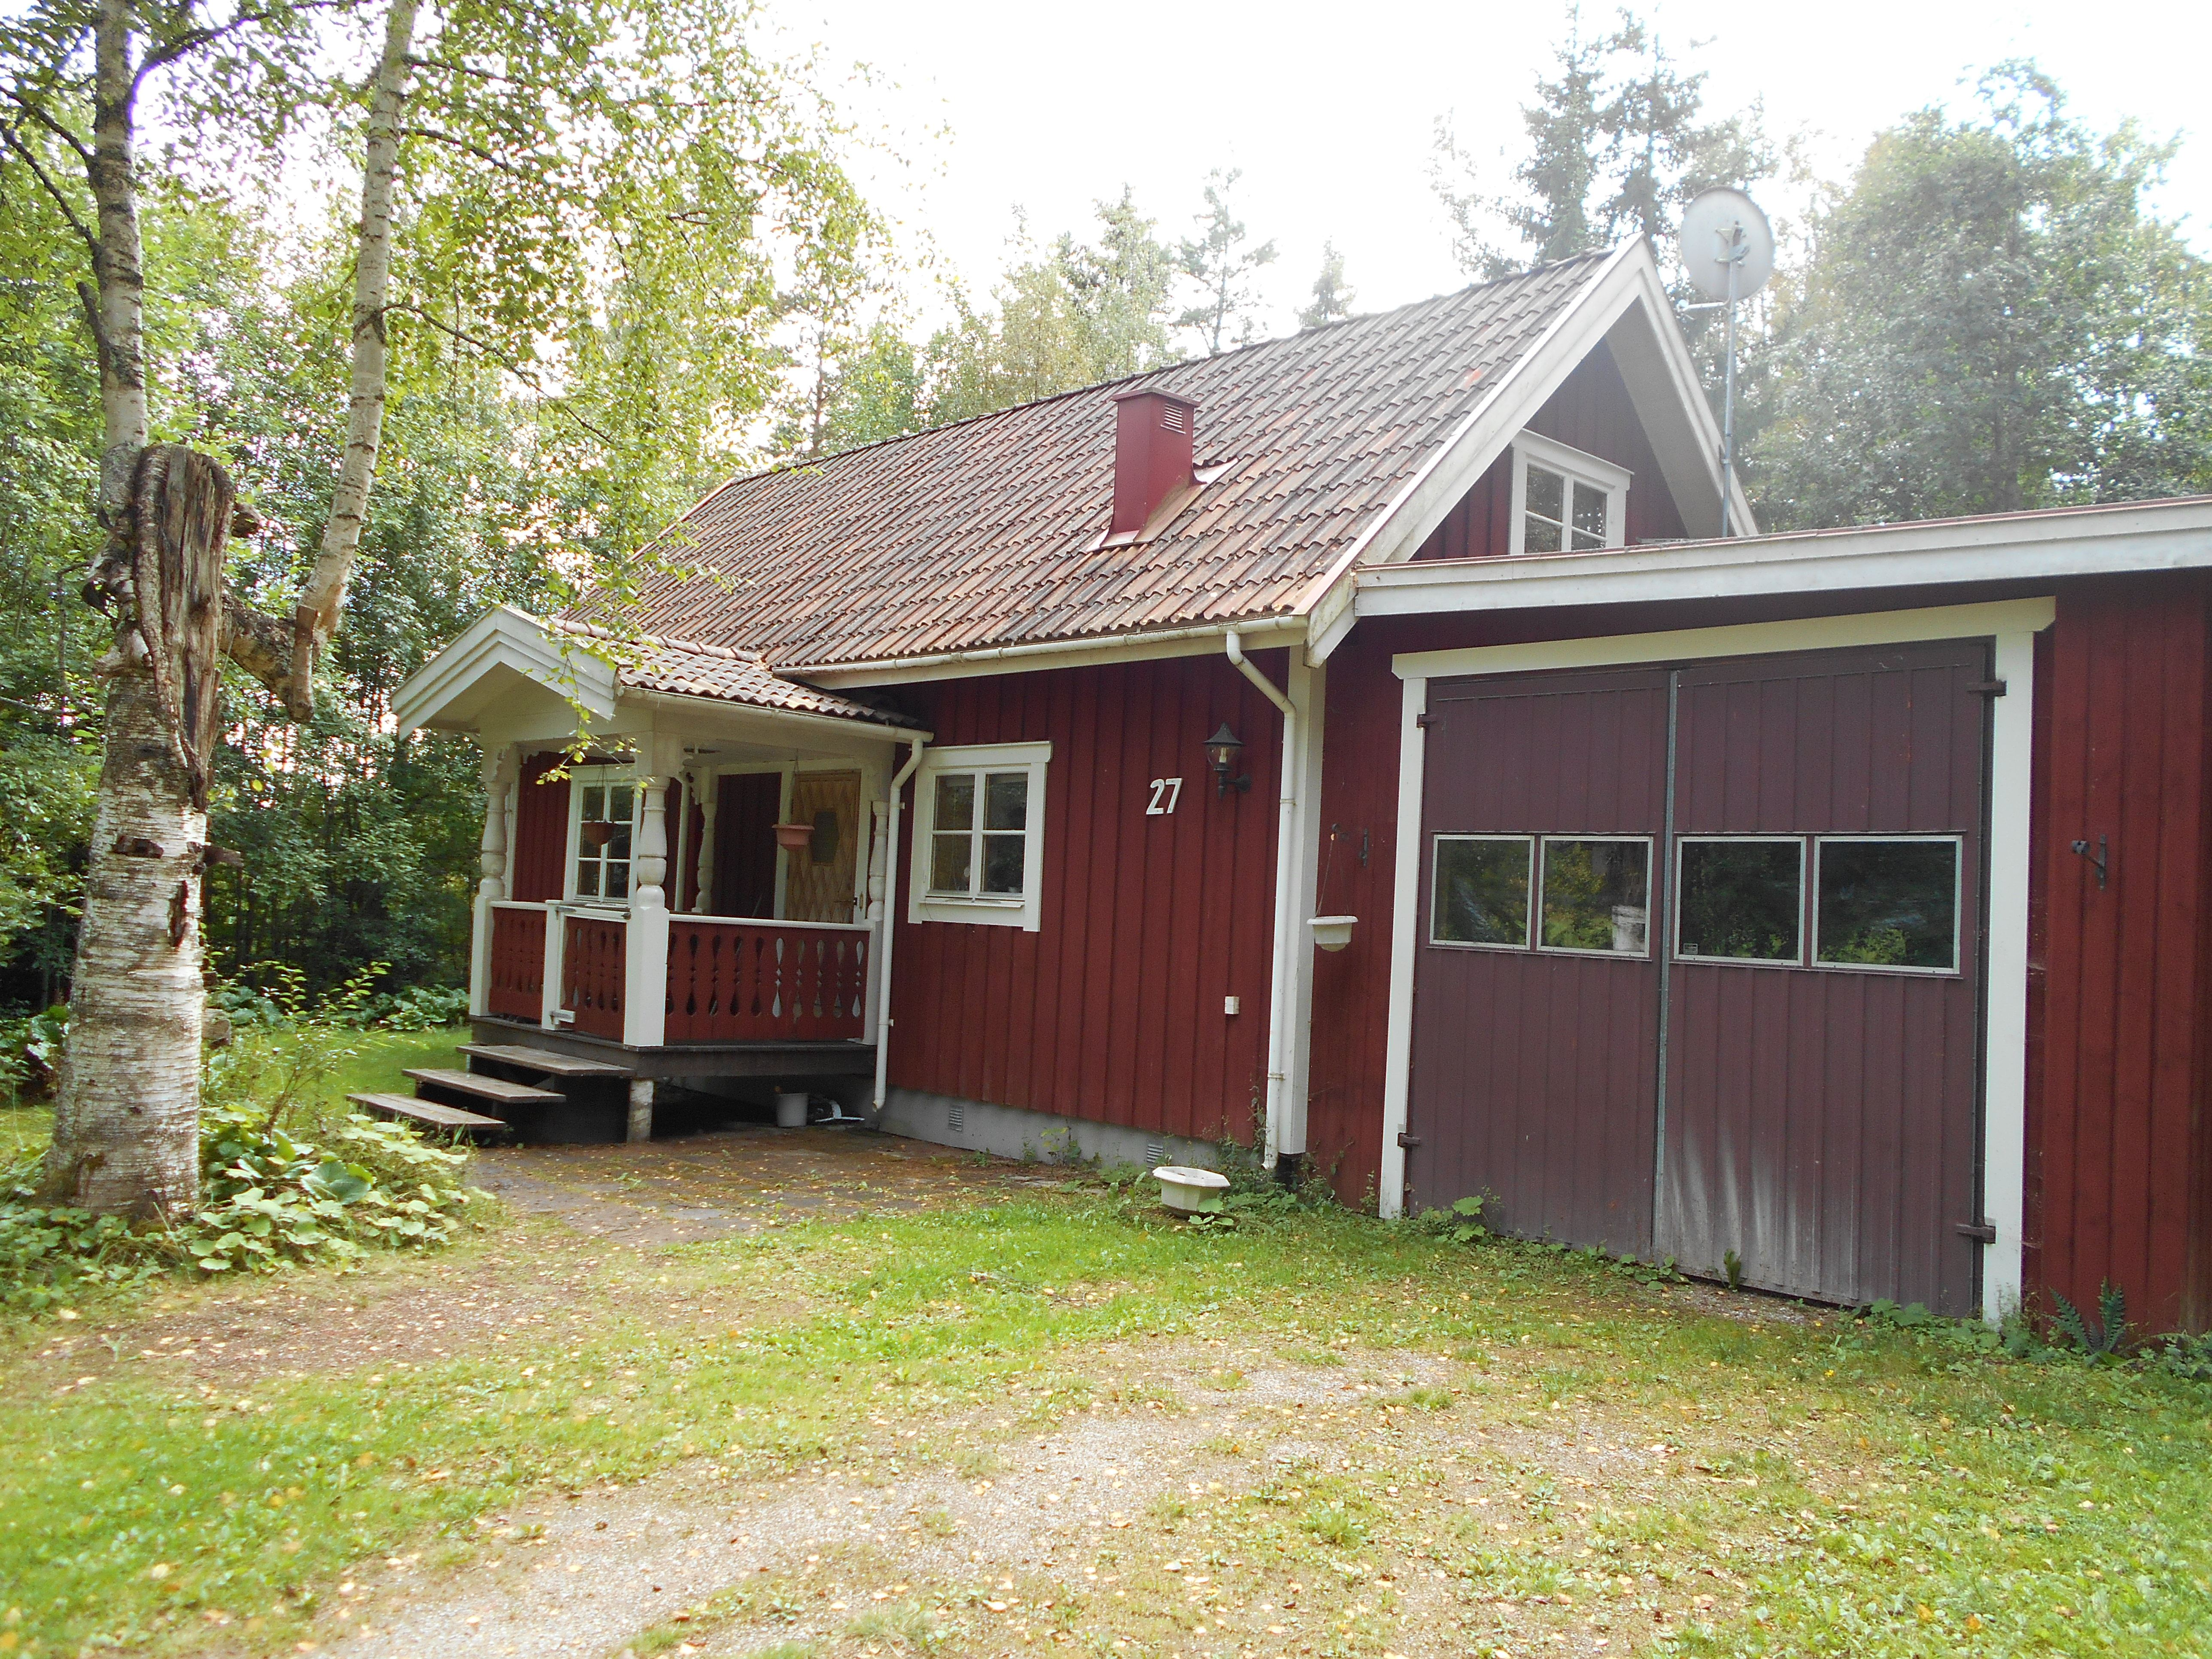 R318 Vikarbyn, 7 km N Rättvik